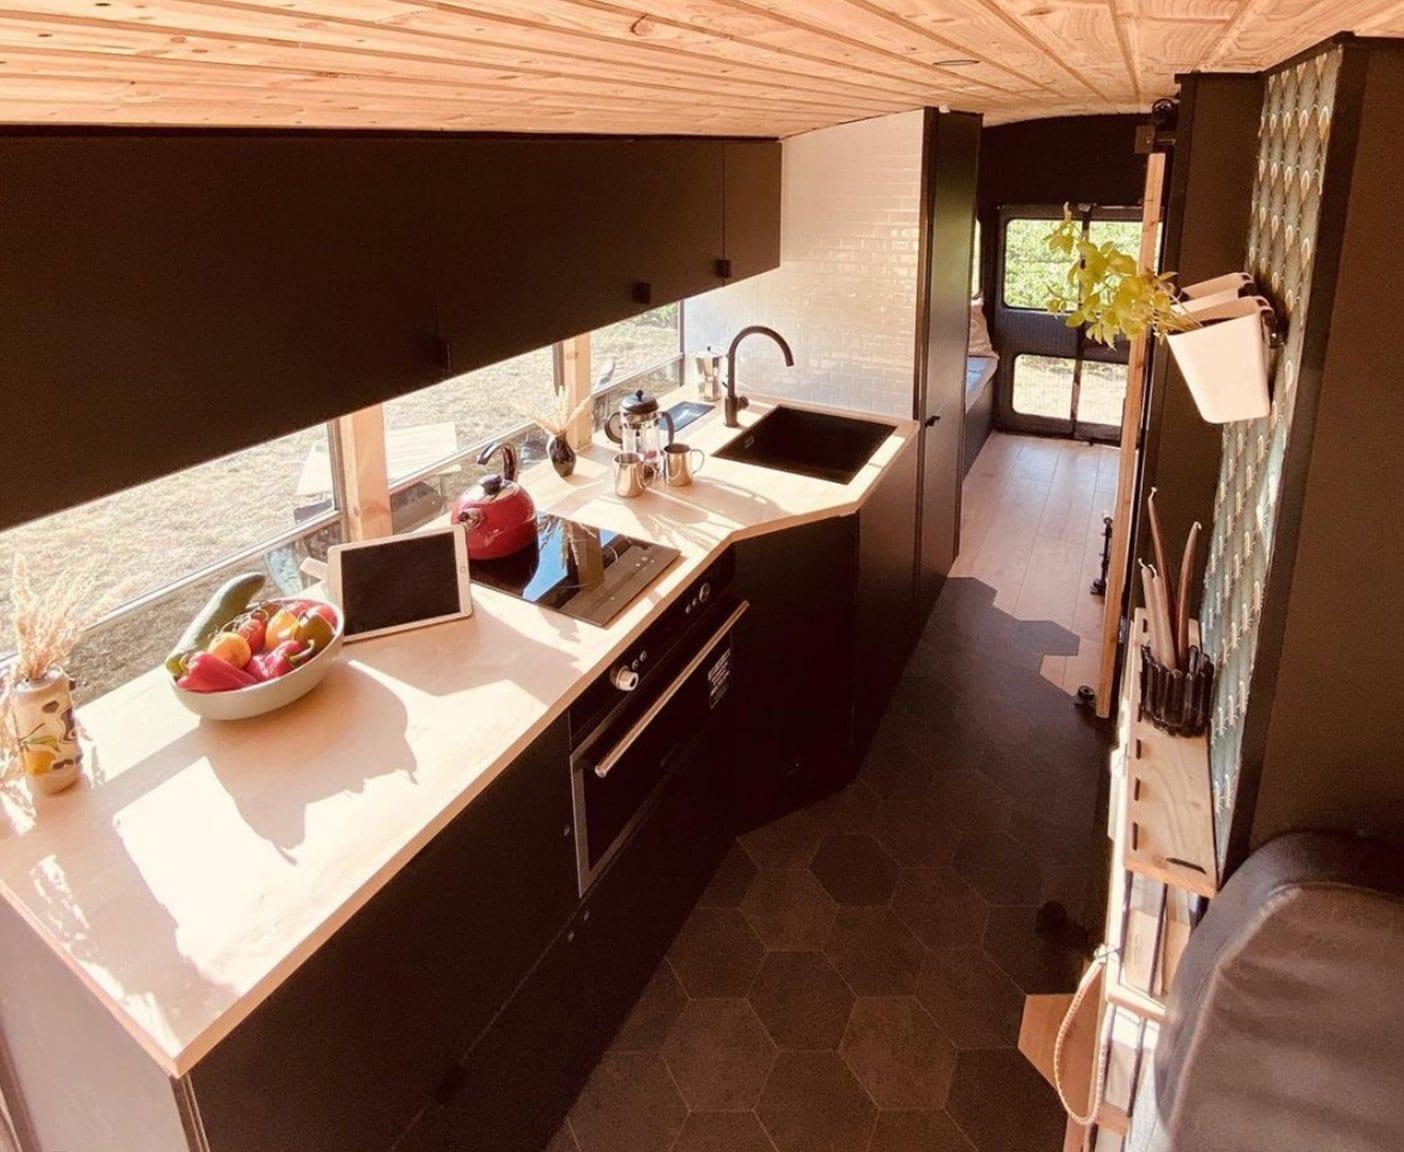 skoolie-camper-kueche-instagram-selber-bauen-wohnwagen-ikea-kuechenmodule-camper-gebraucht-kaufen-minikueche-einrichten-kuechenblock-kuechenausstattung